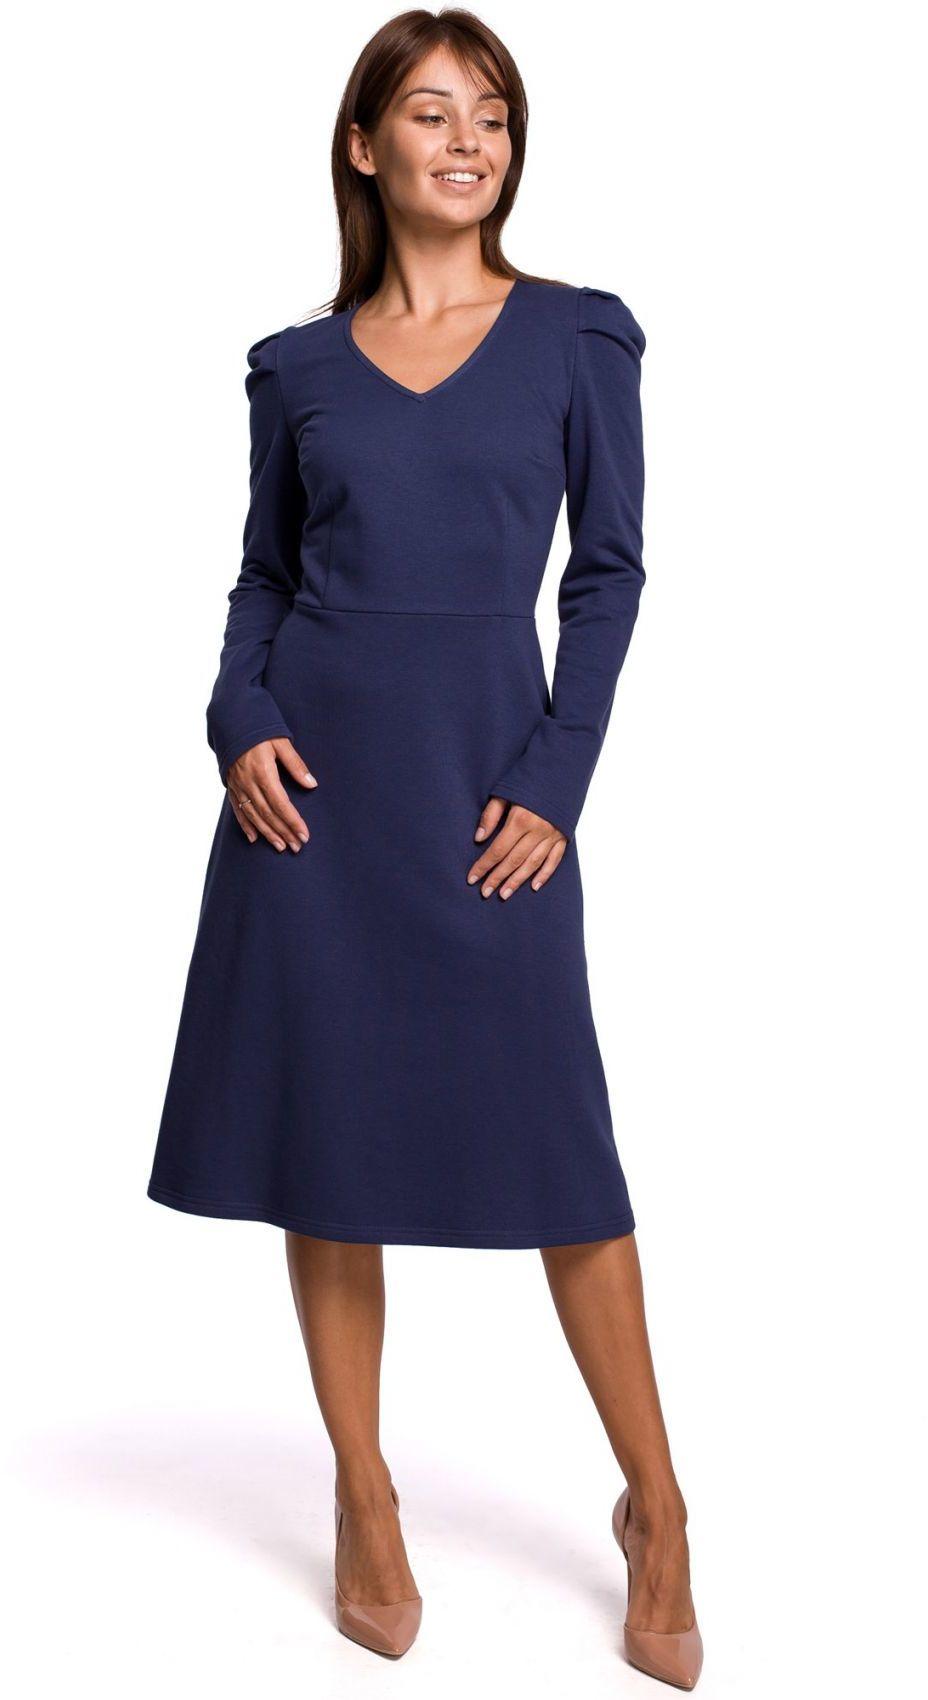 B162 Sukienka z bufkami - niebieska